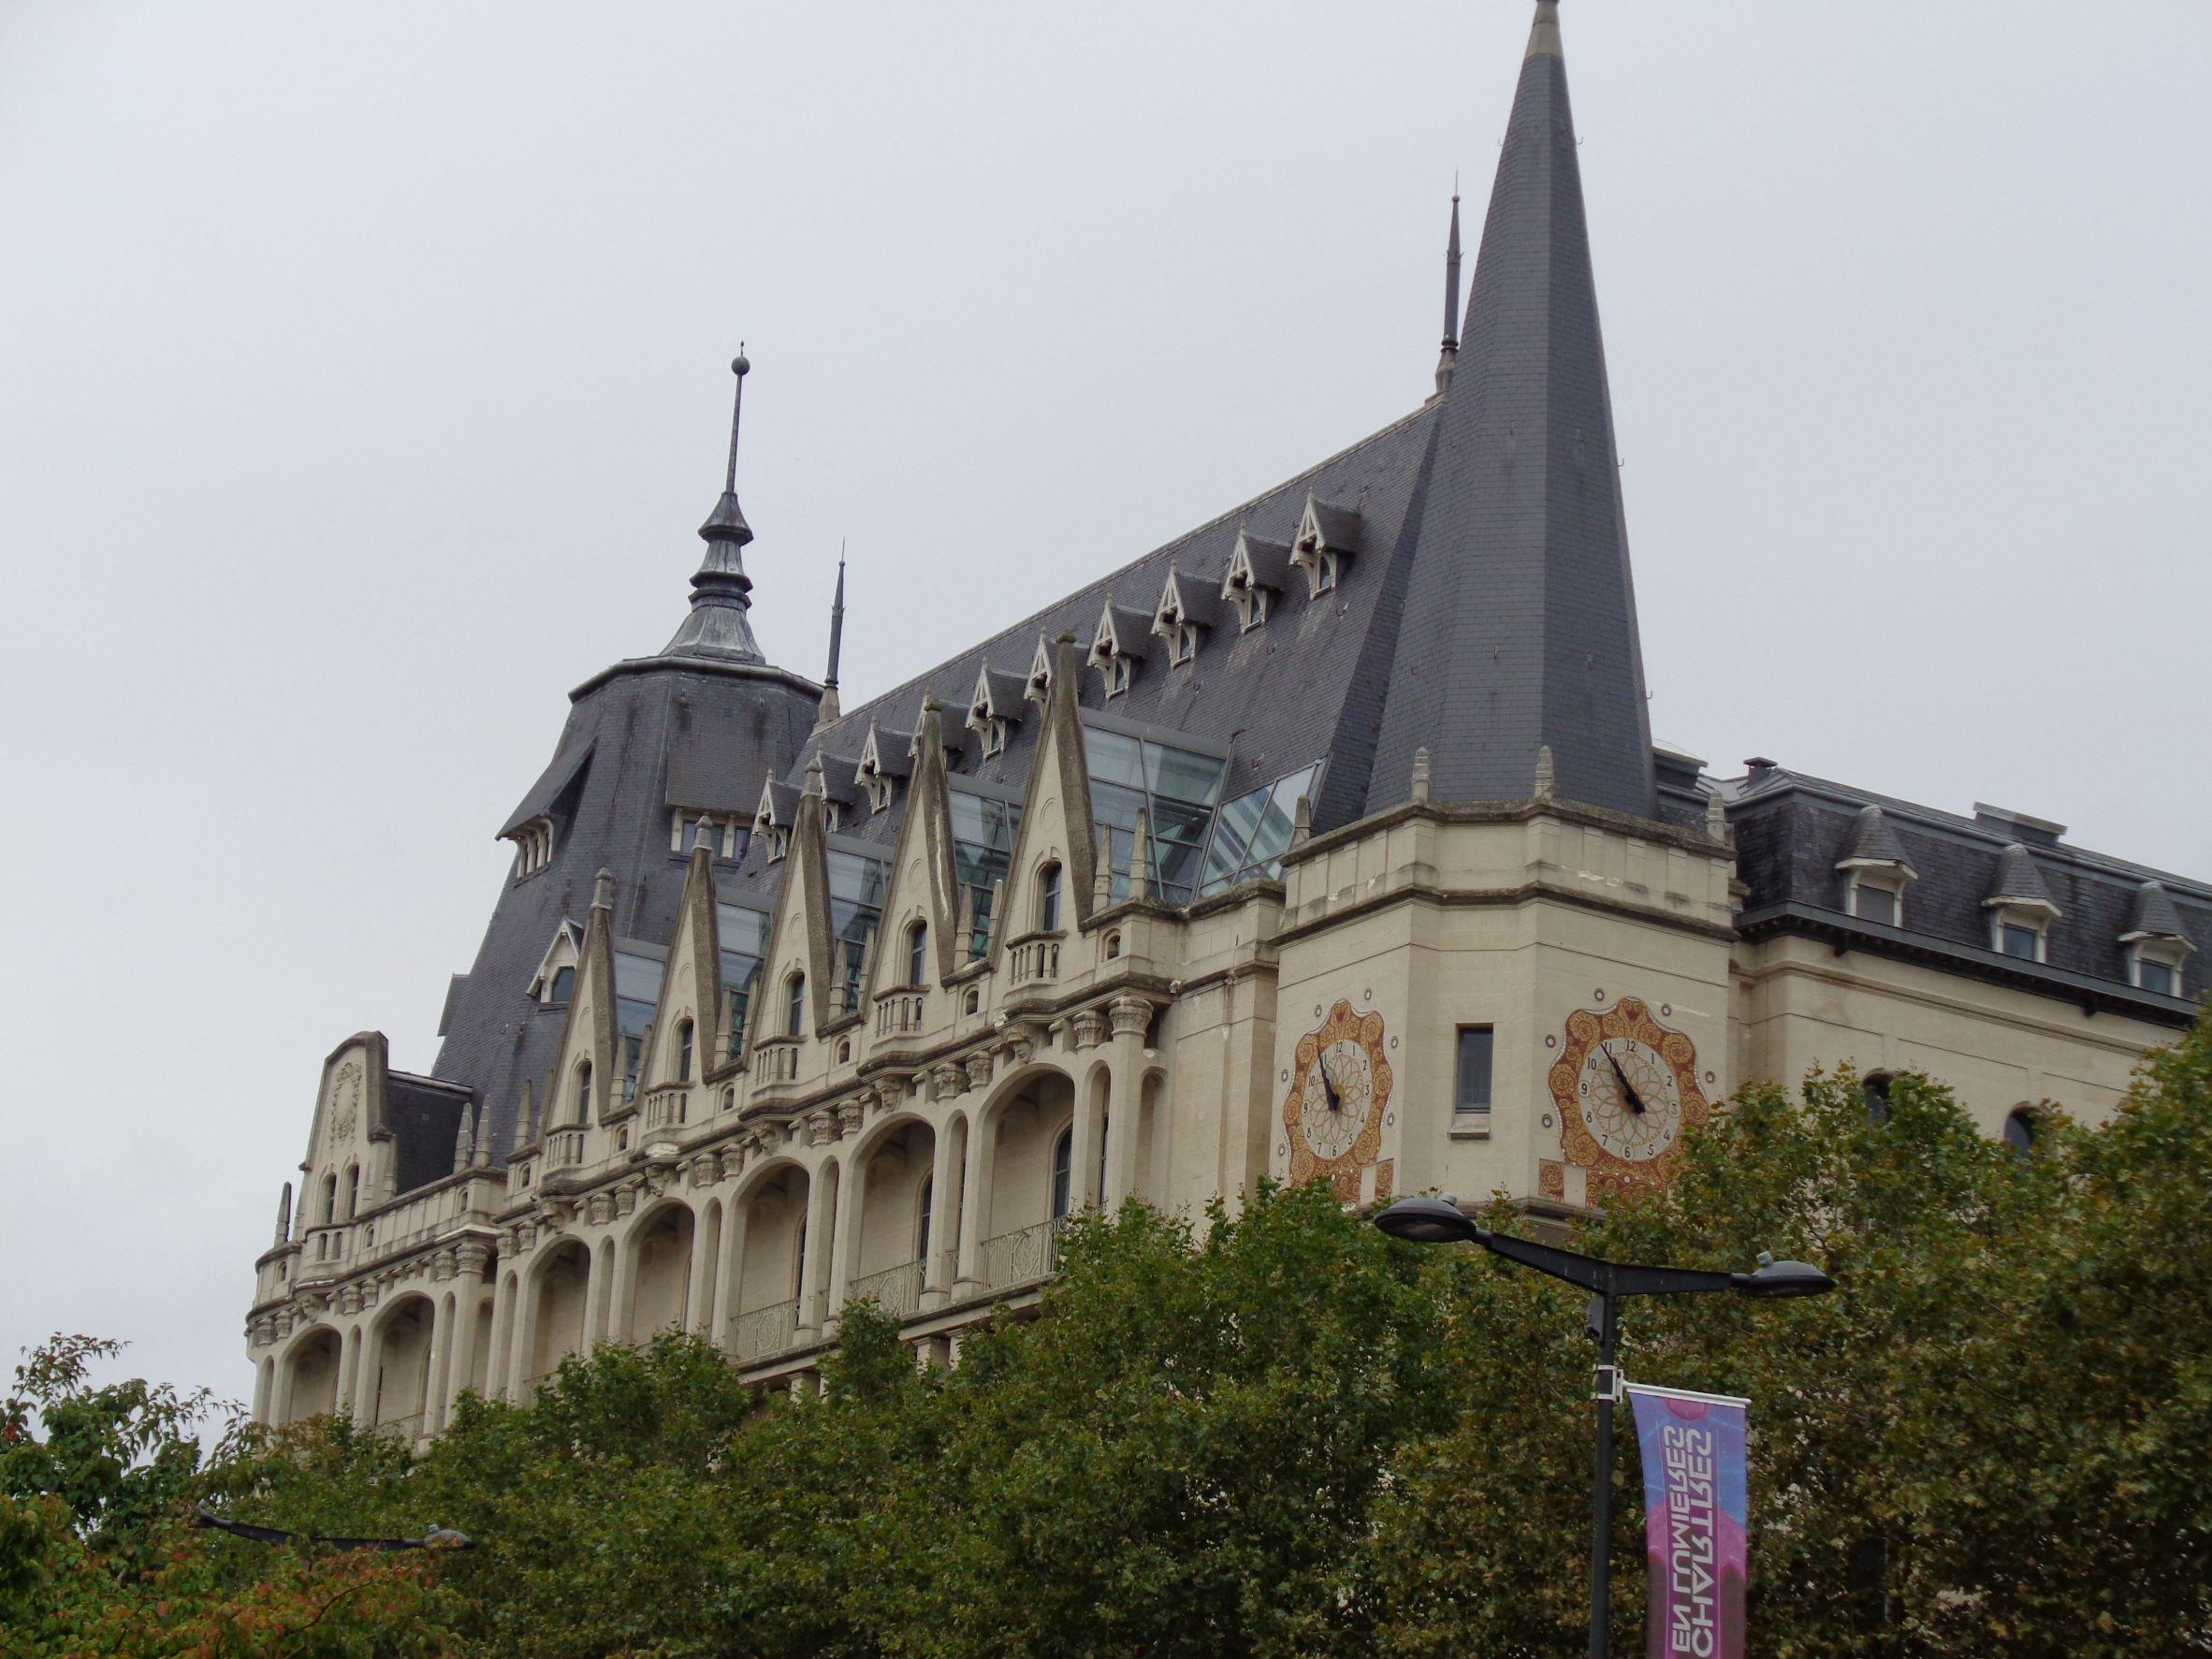 Chartres hotel des postes 1 bd maurice viollette sep21